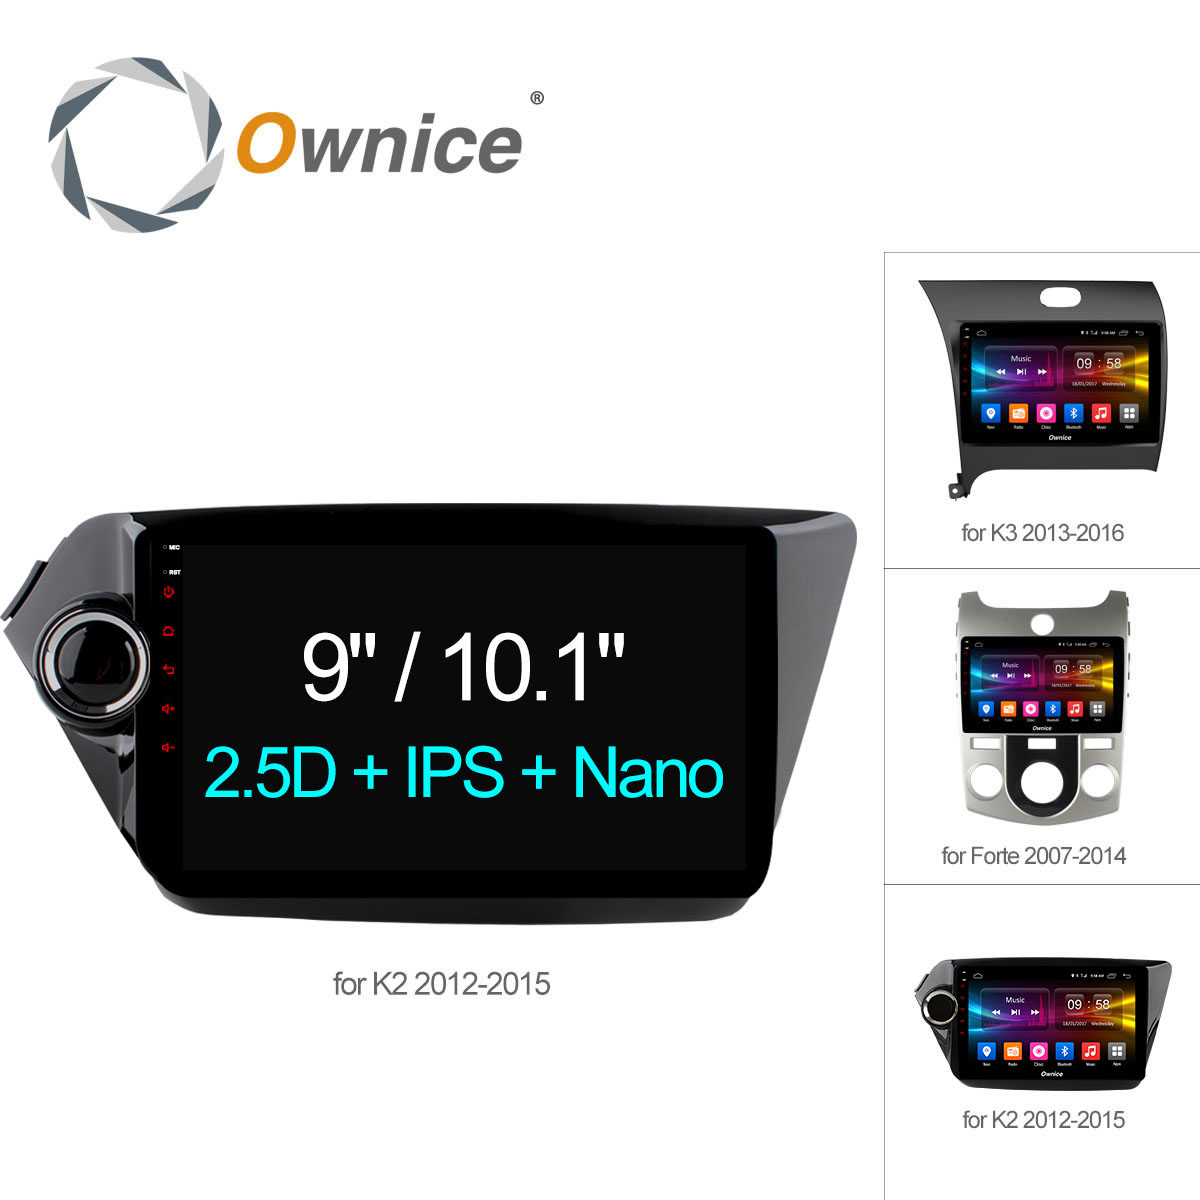 Ownice C500 + Android 6.0 Octa 8 Core autoradio player GPS navi DVD für Kia k2 K3 Forte 2012 2G RAM 32G ROM Unterstützung 4G LTE DAB +